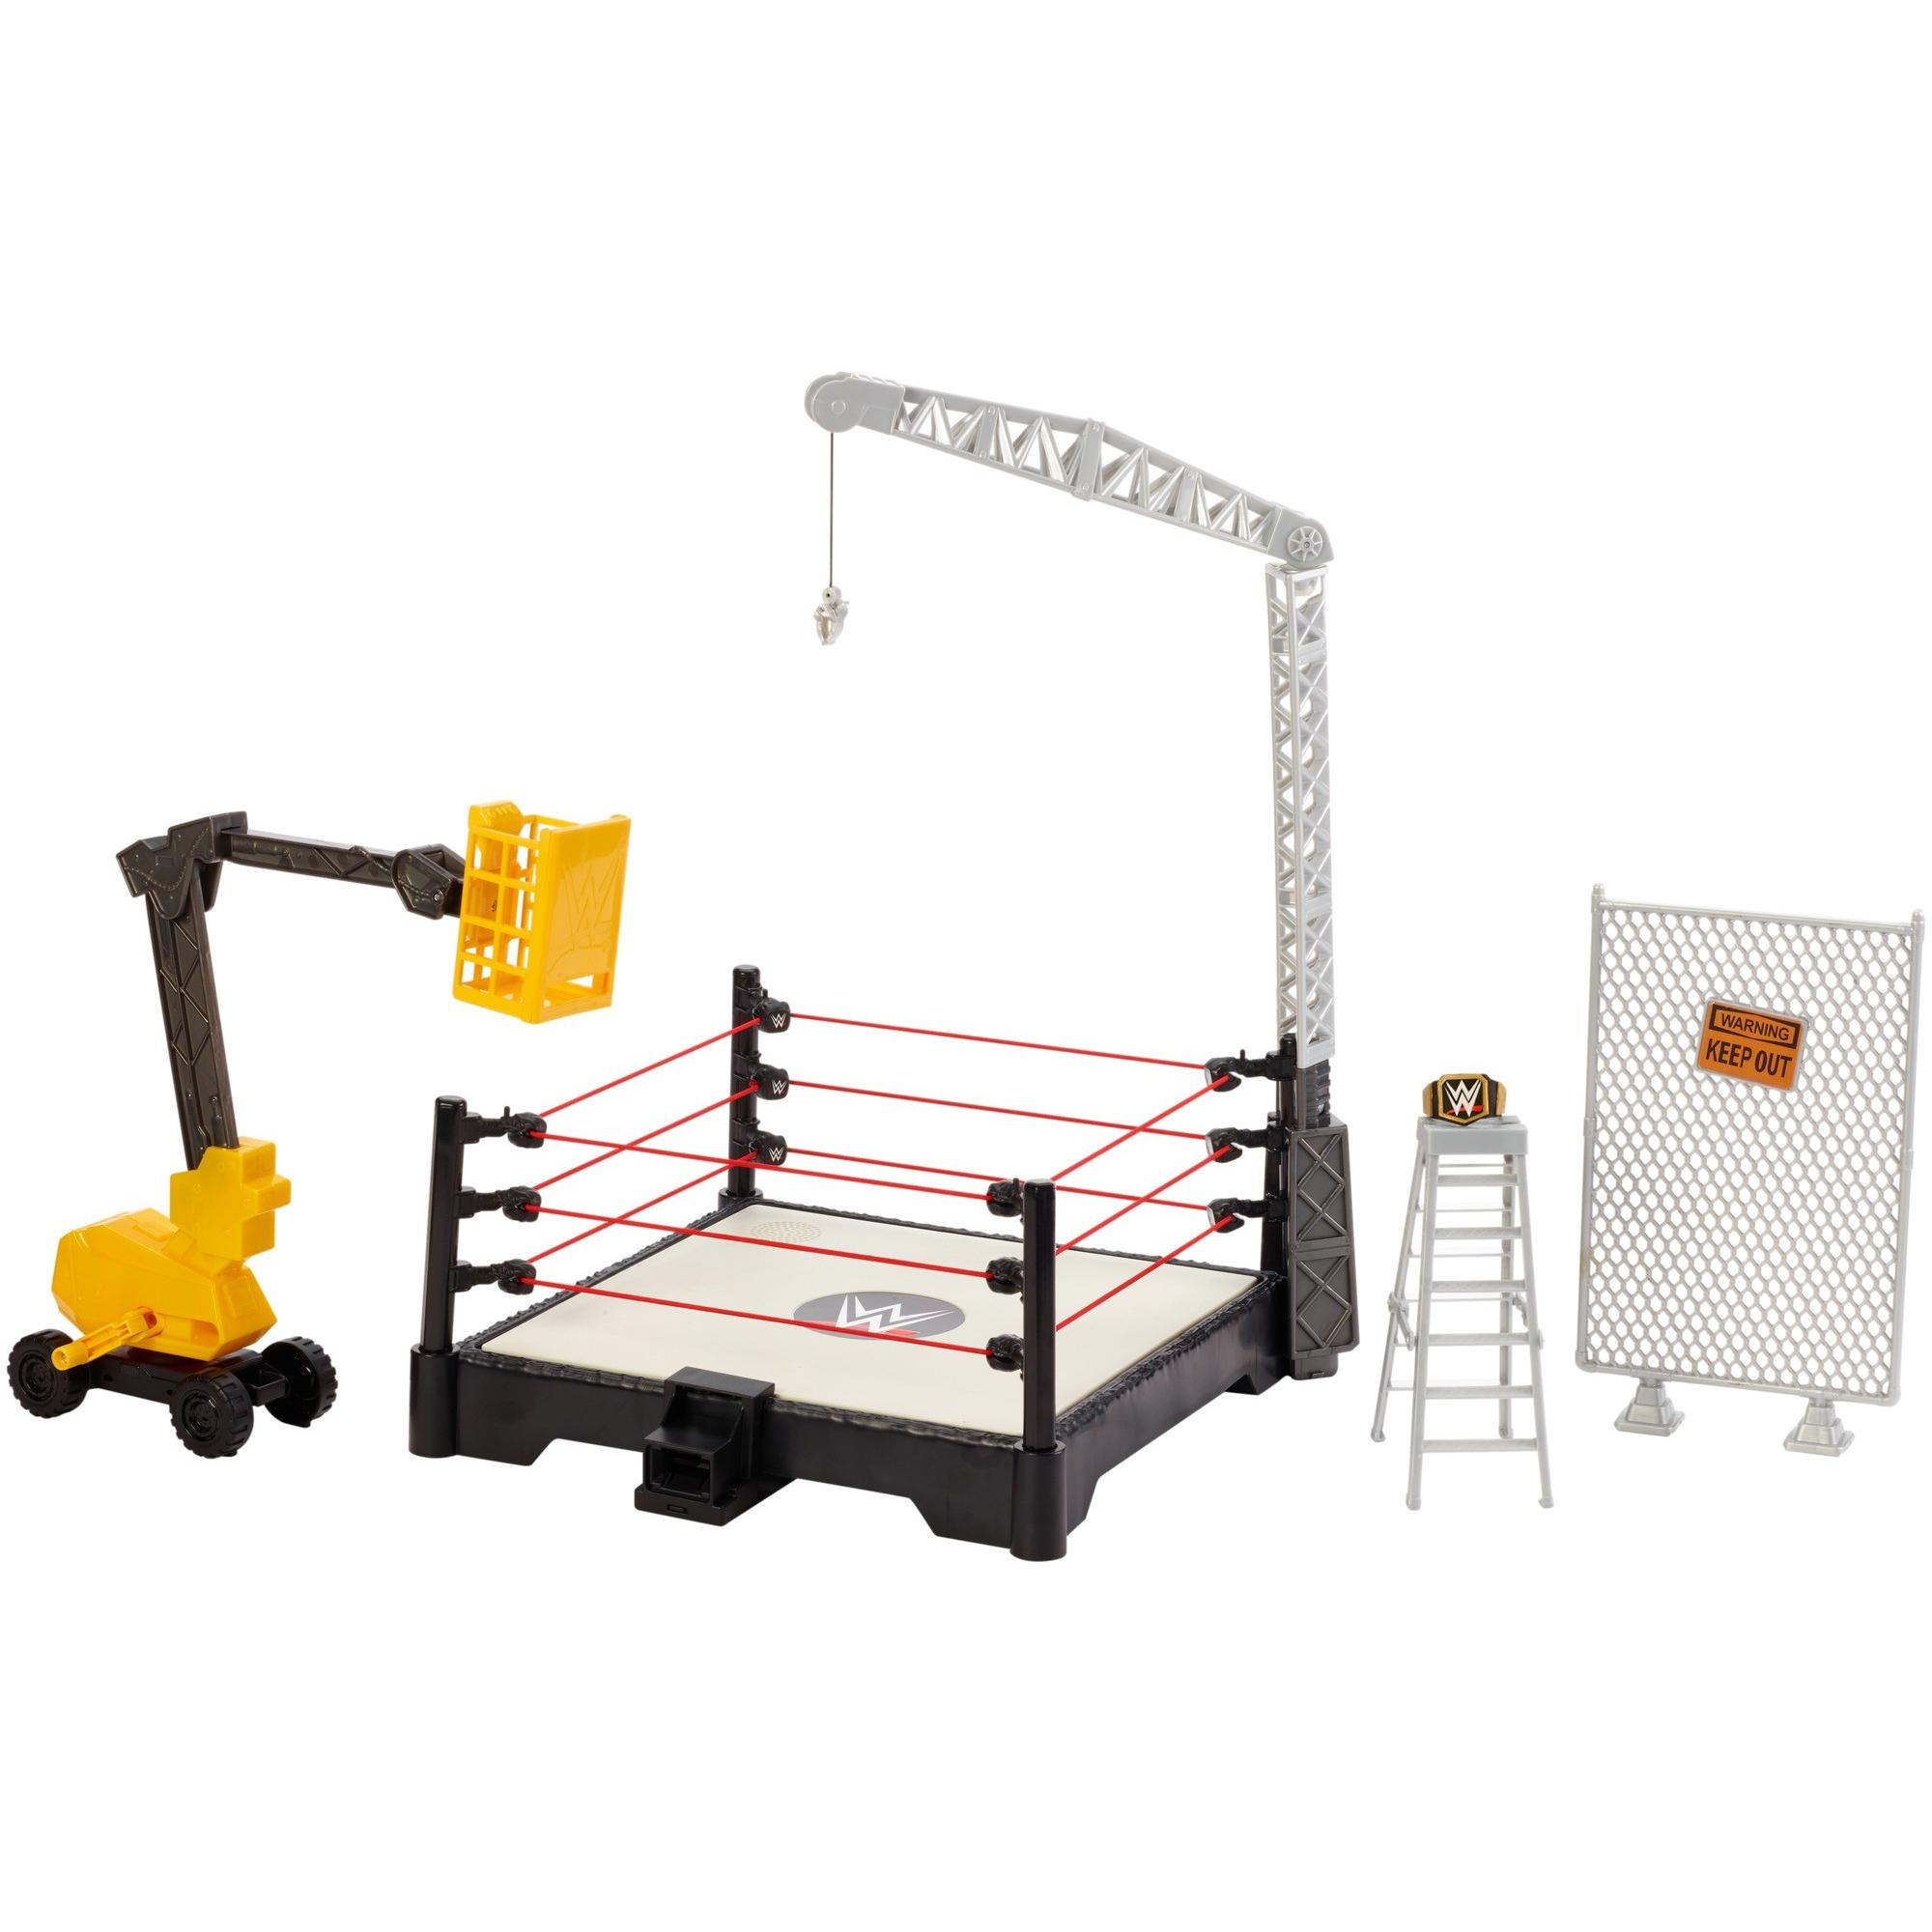 WWE Sound Slammers Destruction Zone Playset by Mattel